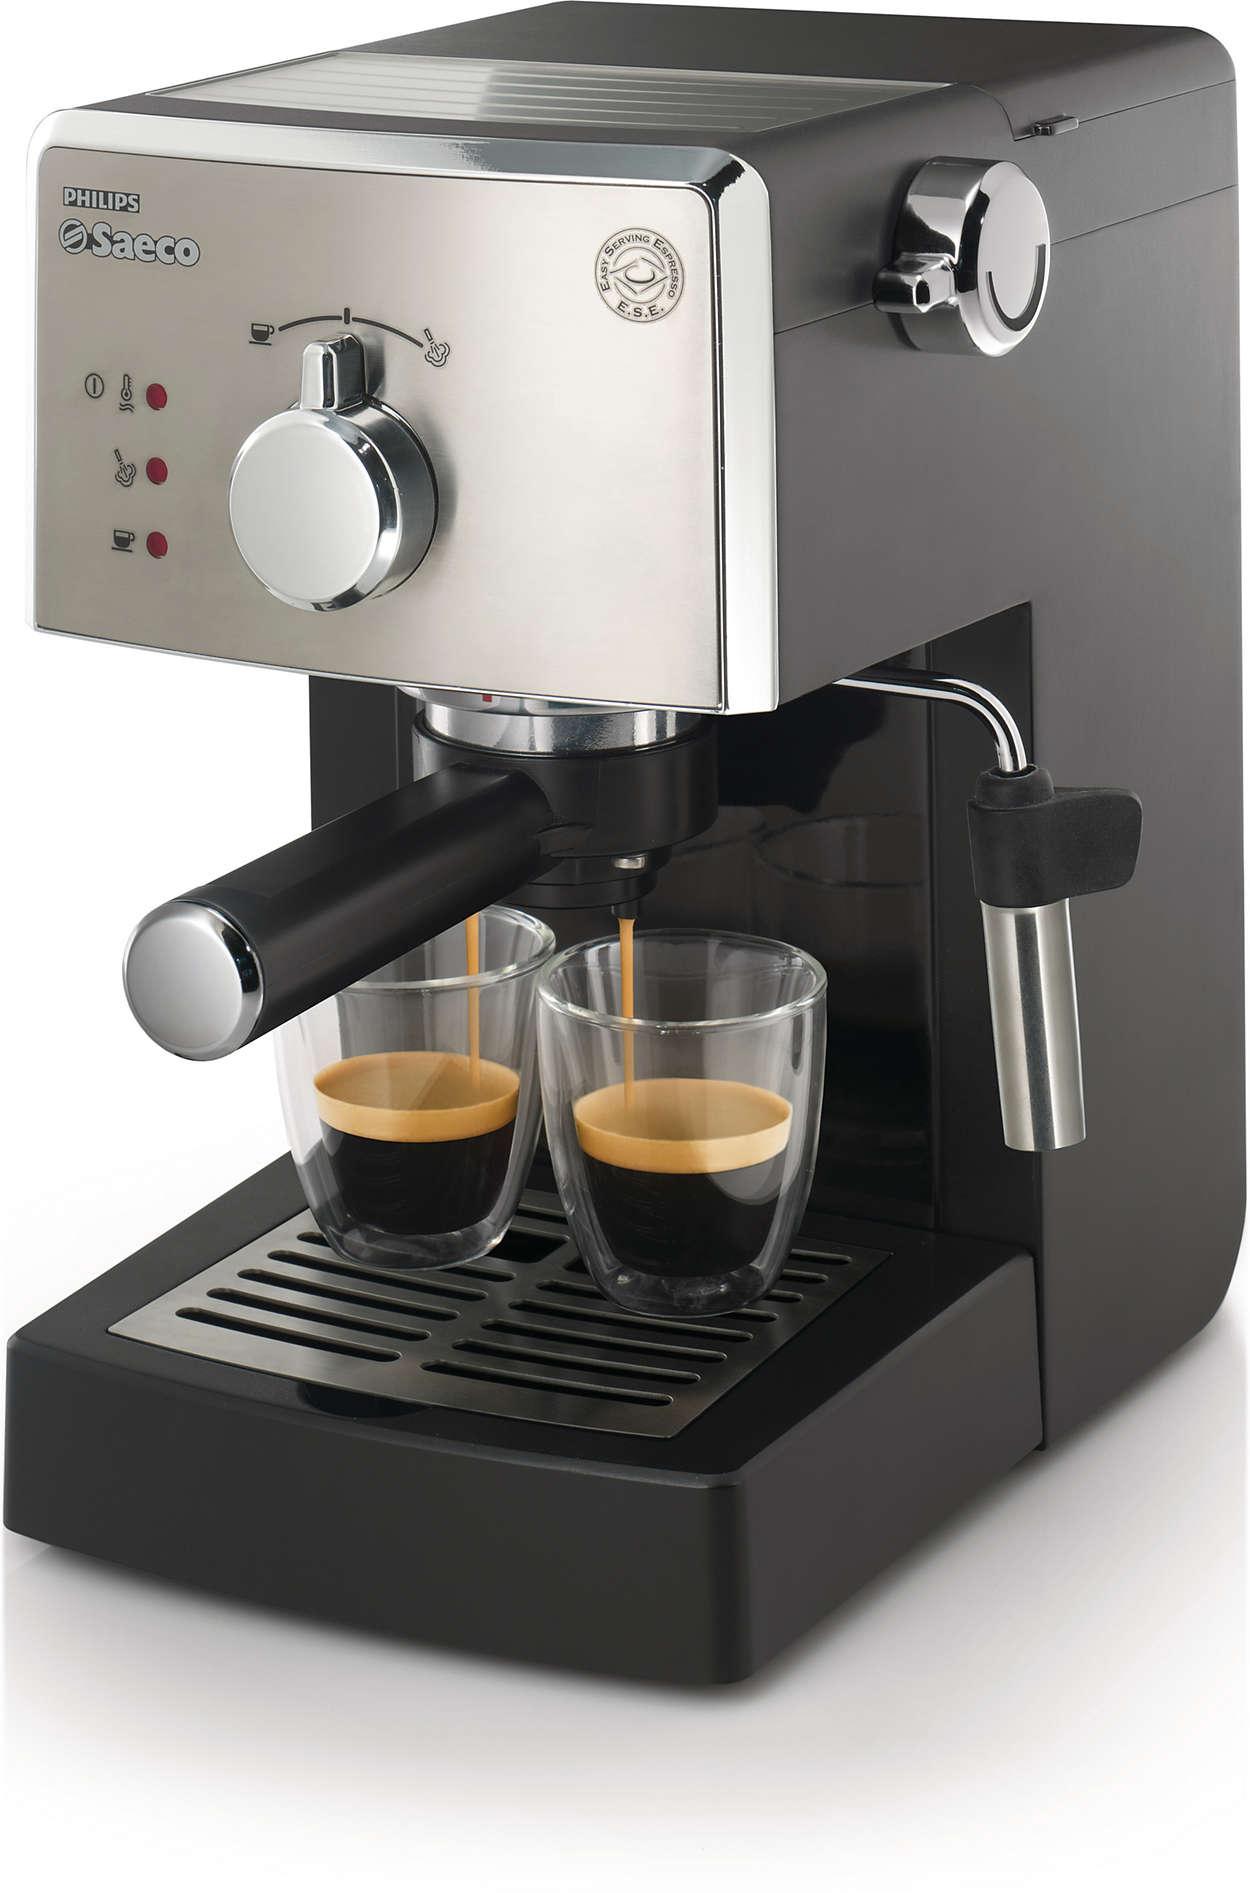 Elke dag authentieke Italiaanse espresso